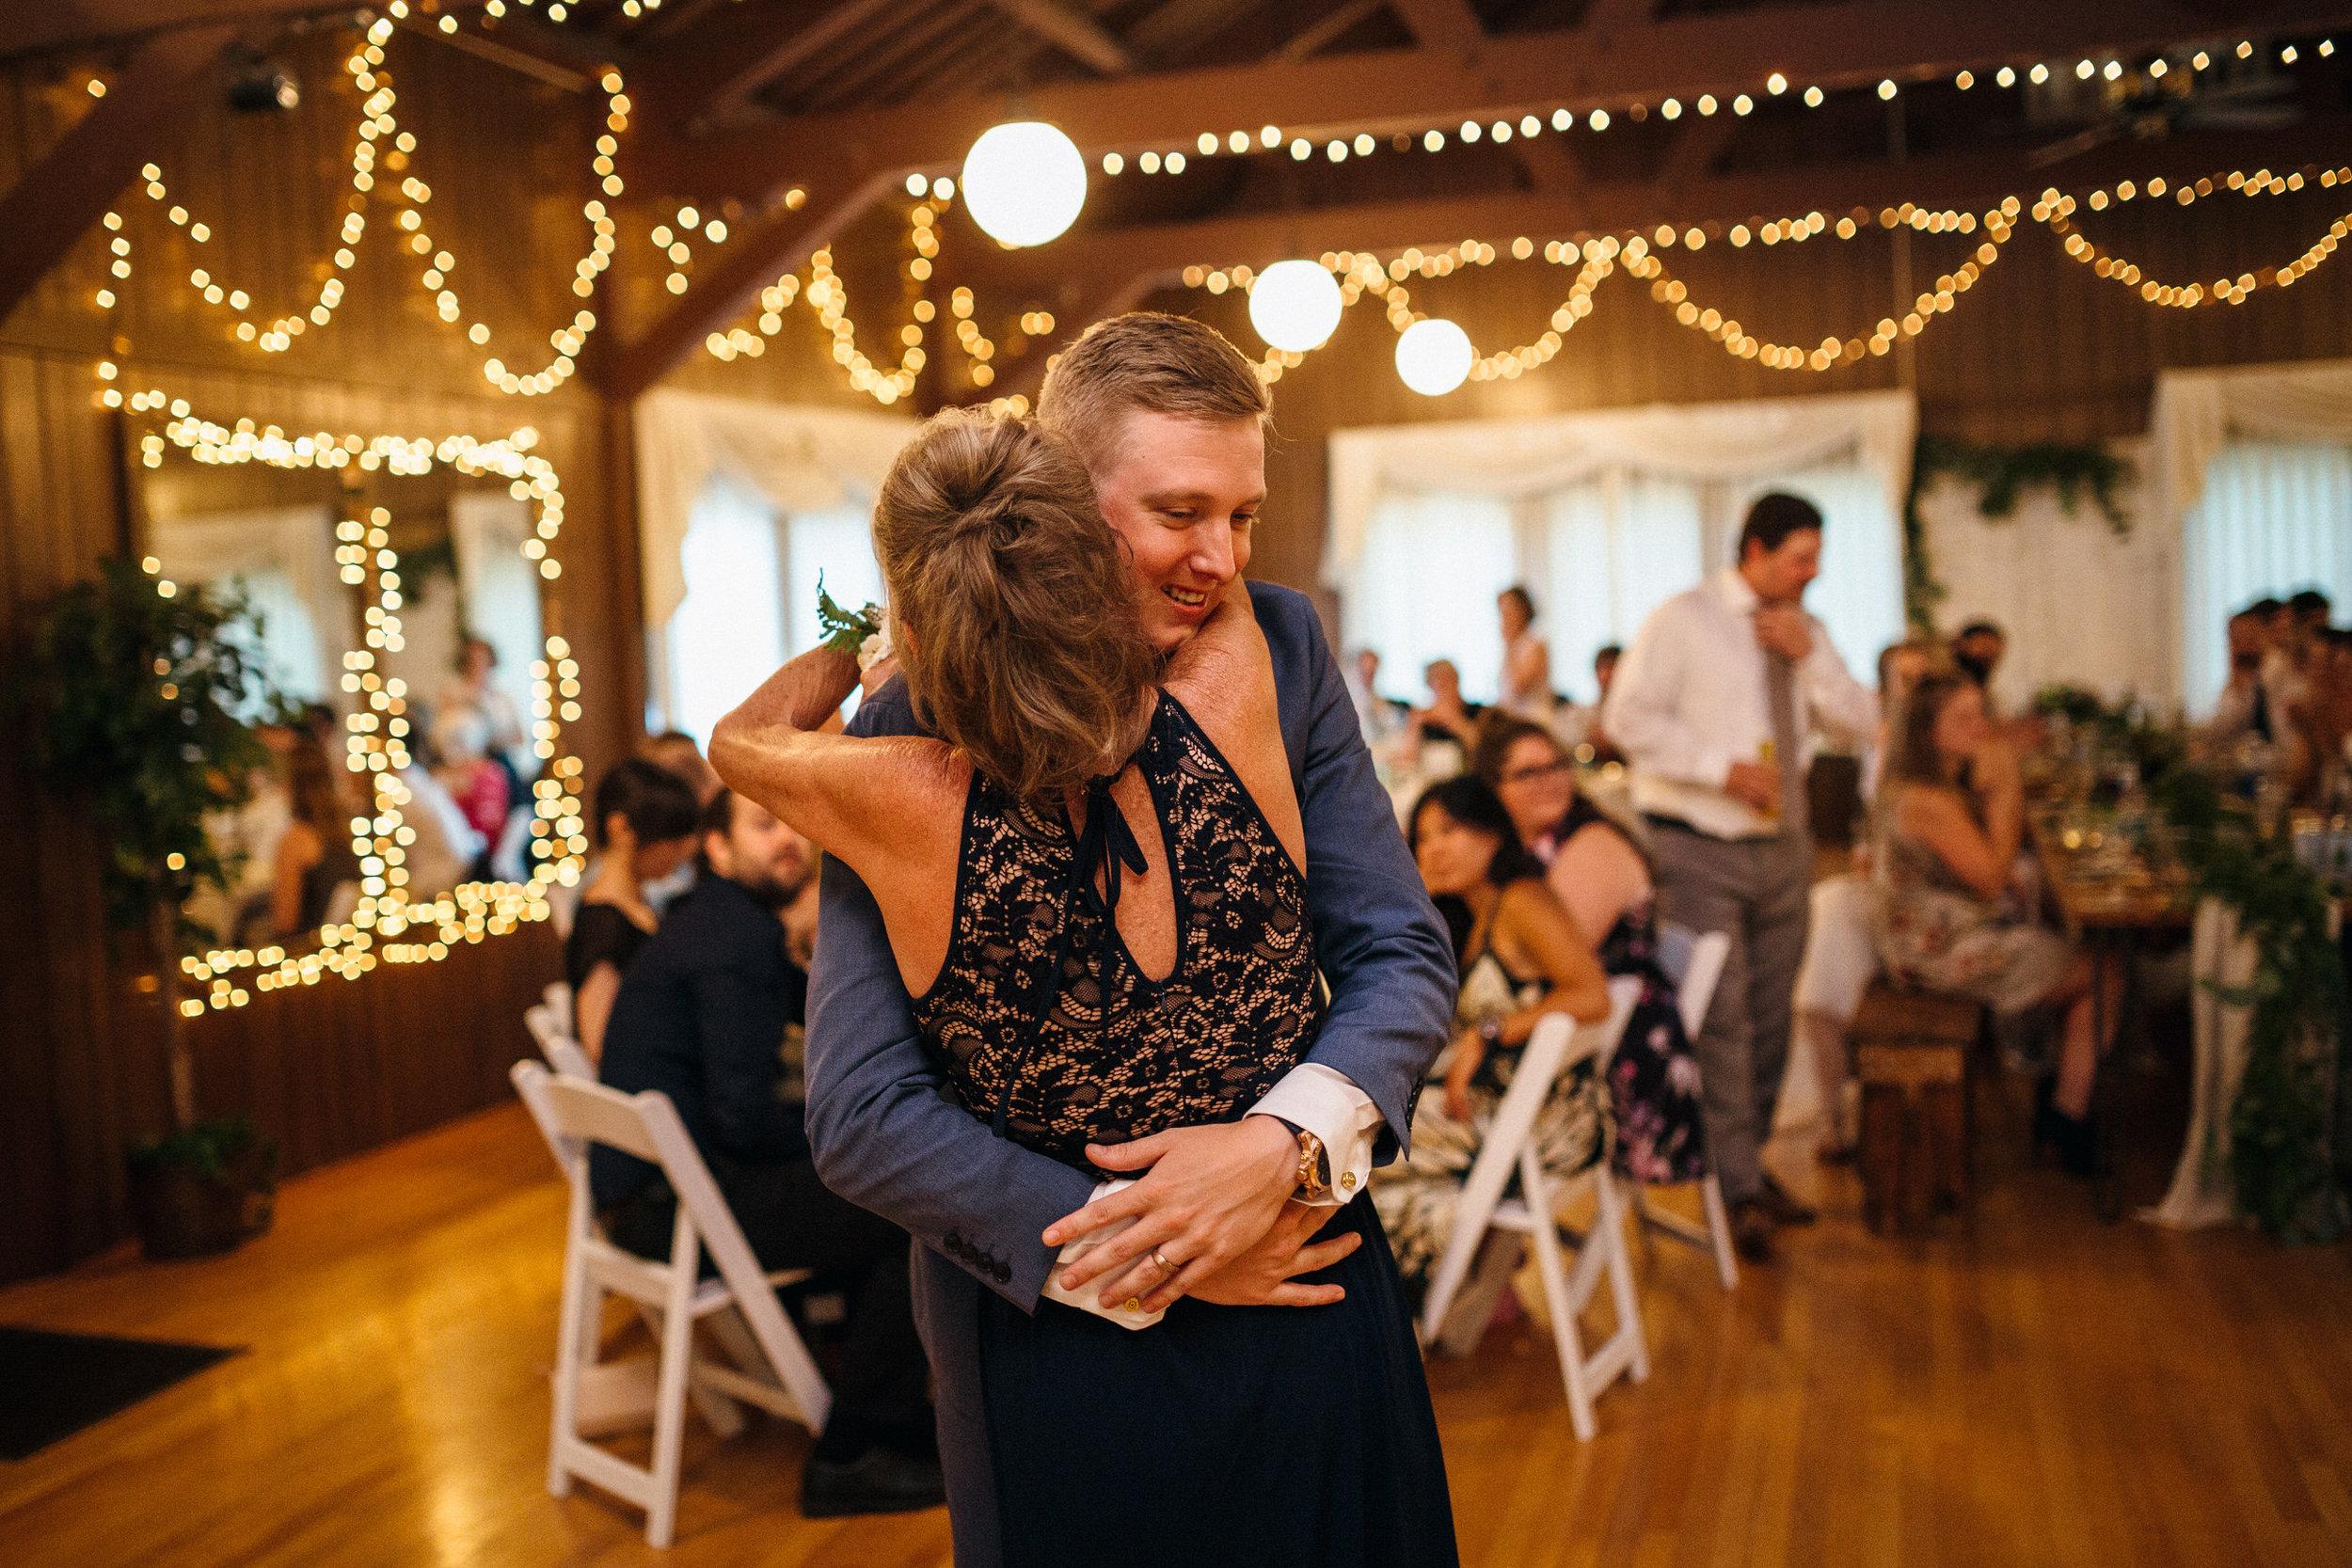 Laurelhurst Park club wedding photographer Portand pdx Oregon094.JPG